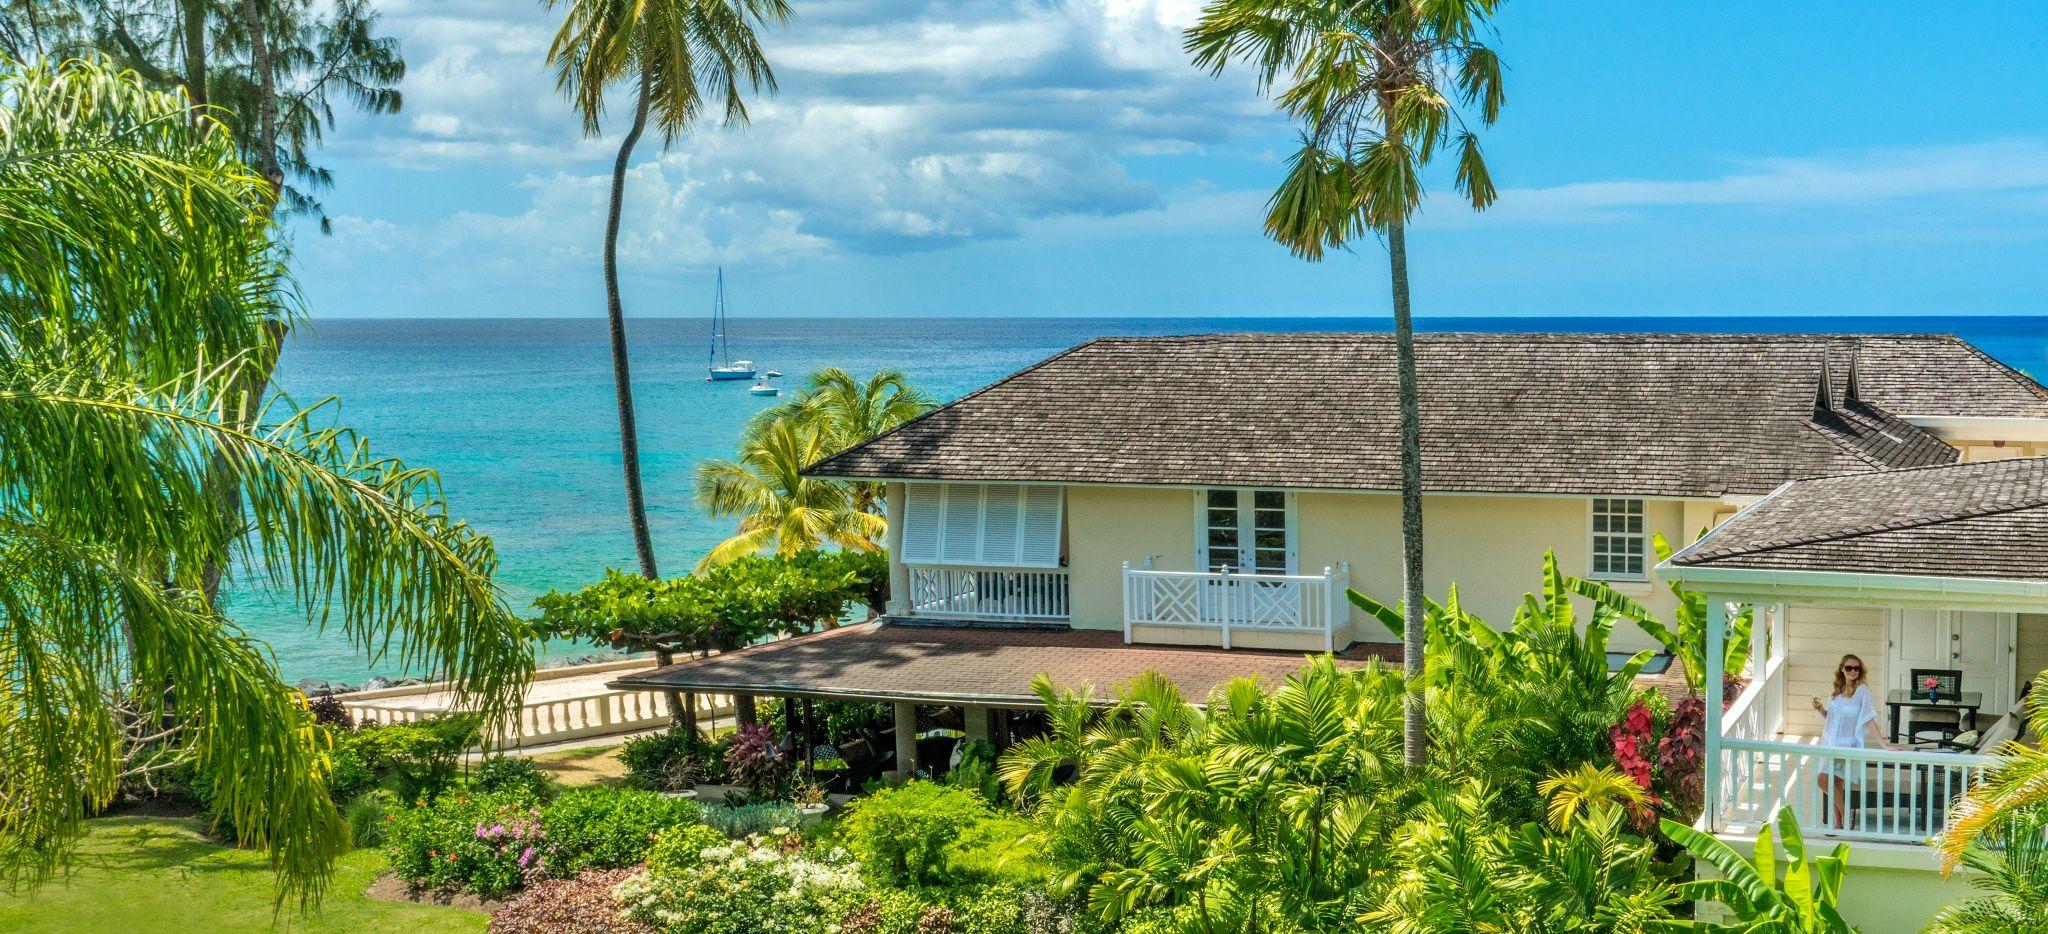 "Ein Hotelzimmer am Strand im Hotel ""Coral Reef Club Barbados"""